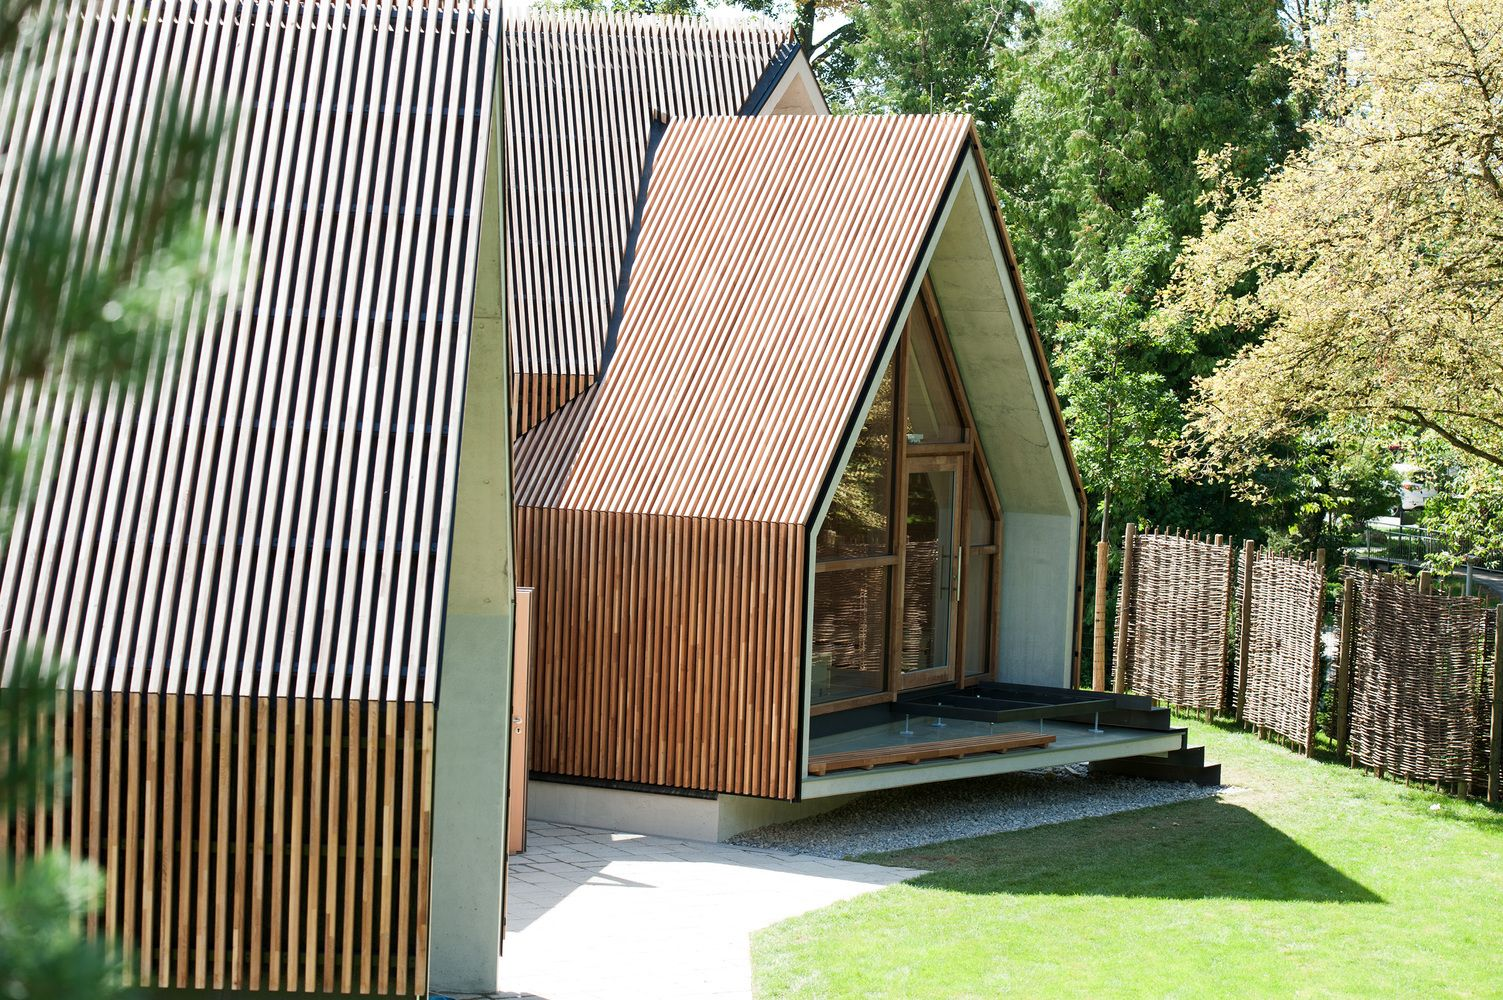 Galer a de sauna jordanbad jeschke architektur planung - Construccion de saunas ...